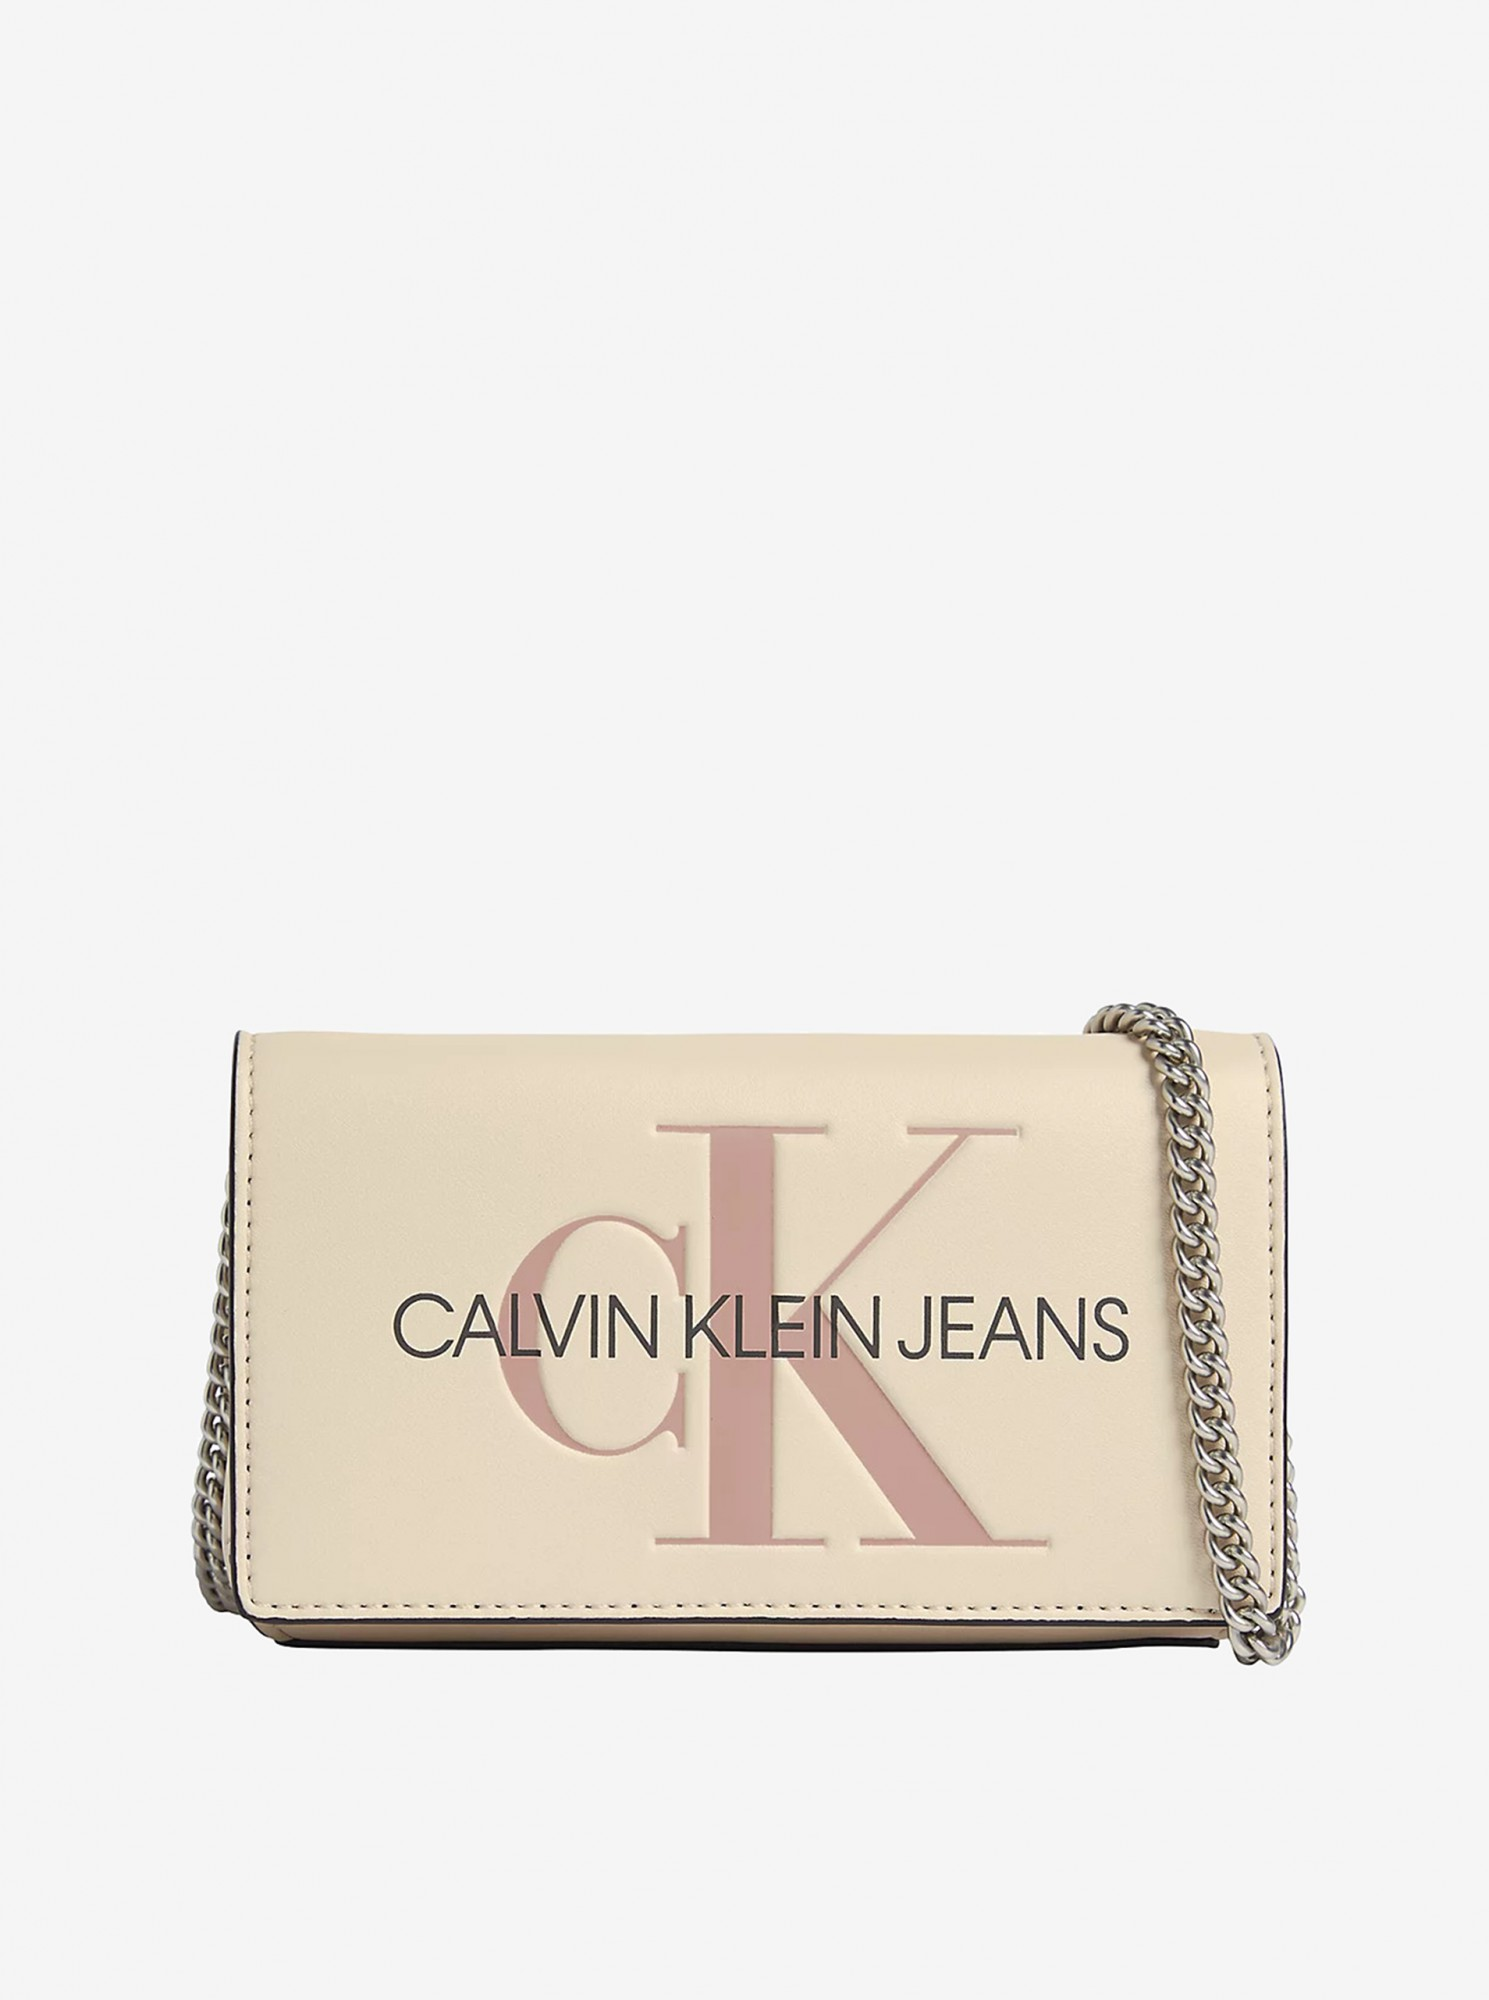 Calvin Klein smantanii/crem crossbody geanta